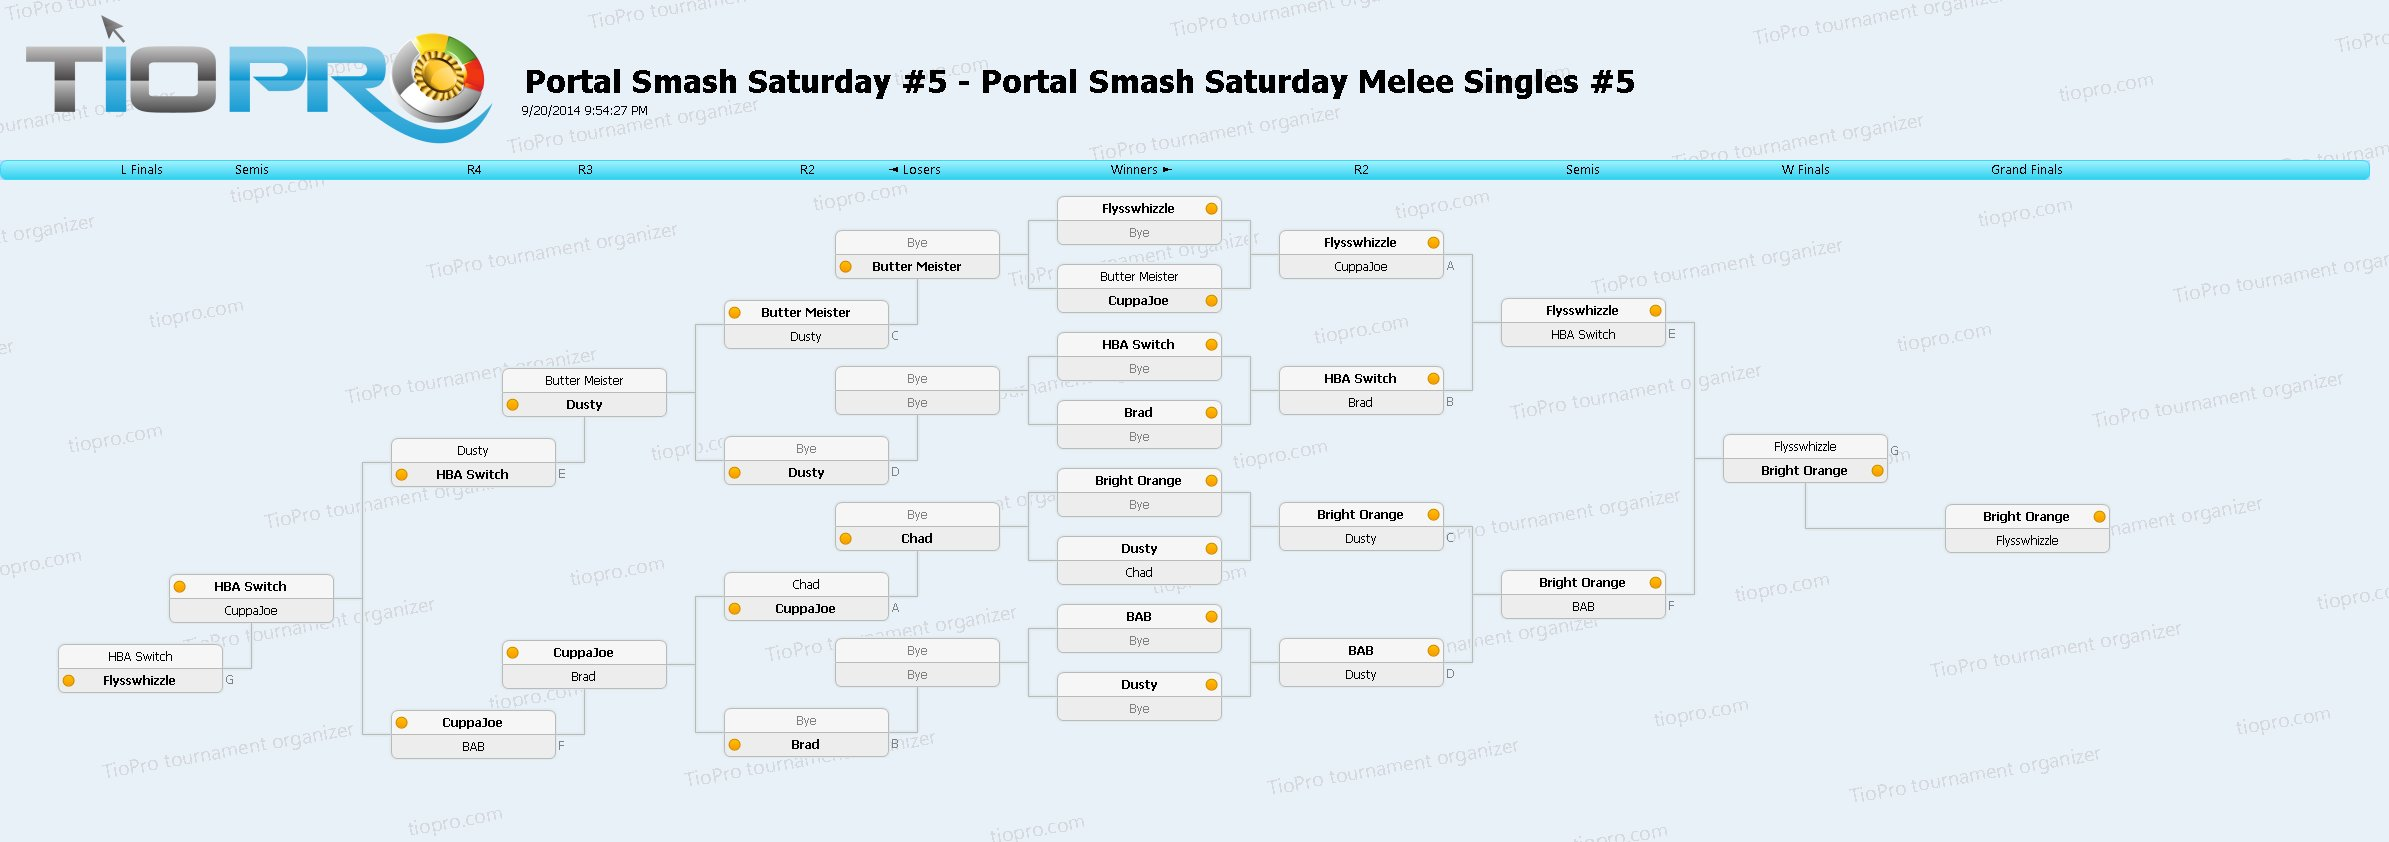 Portal Smash Saturday Melee Singles #5